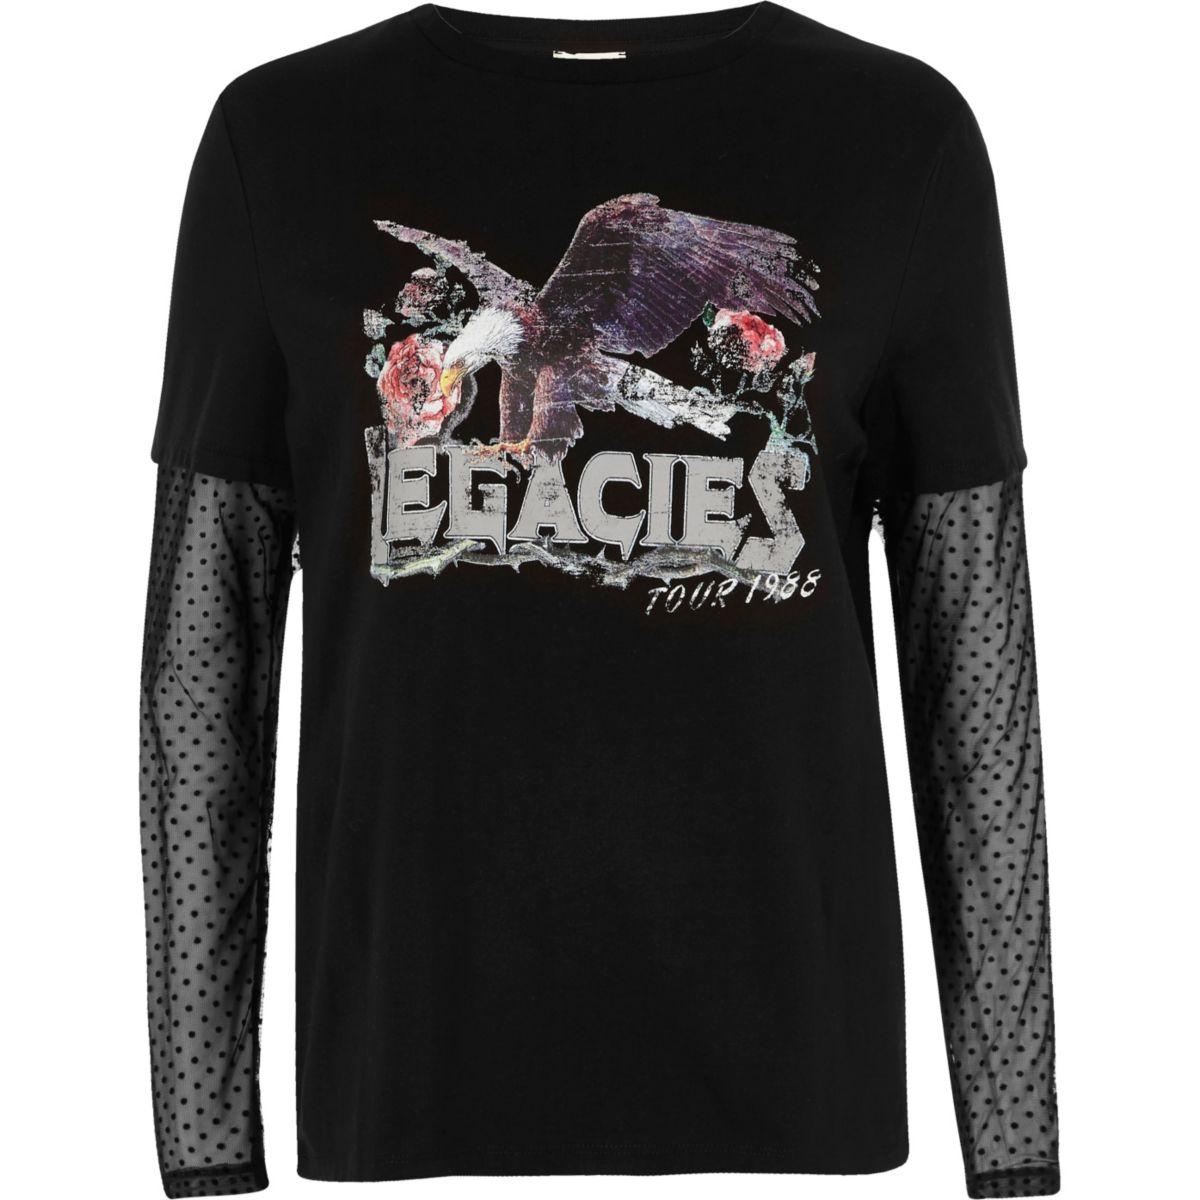 Black mesh sleeve band print T-shirt